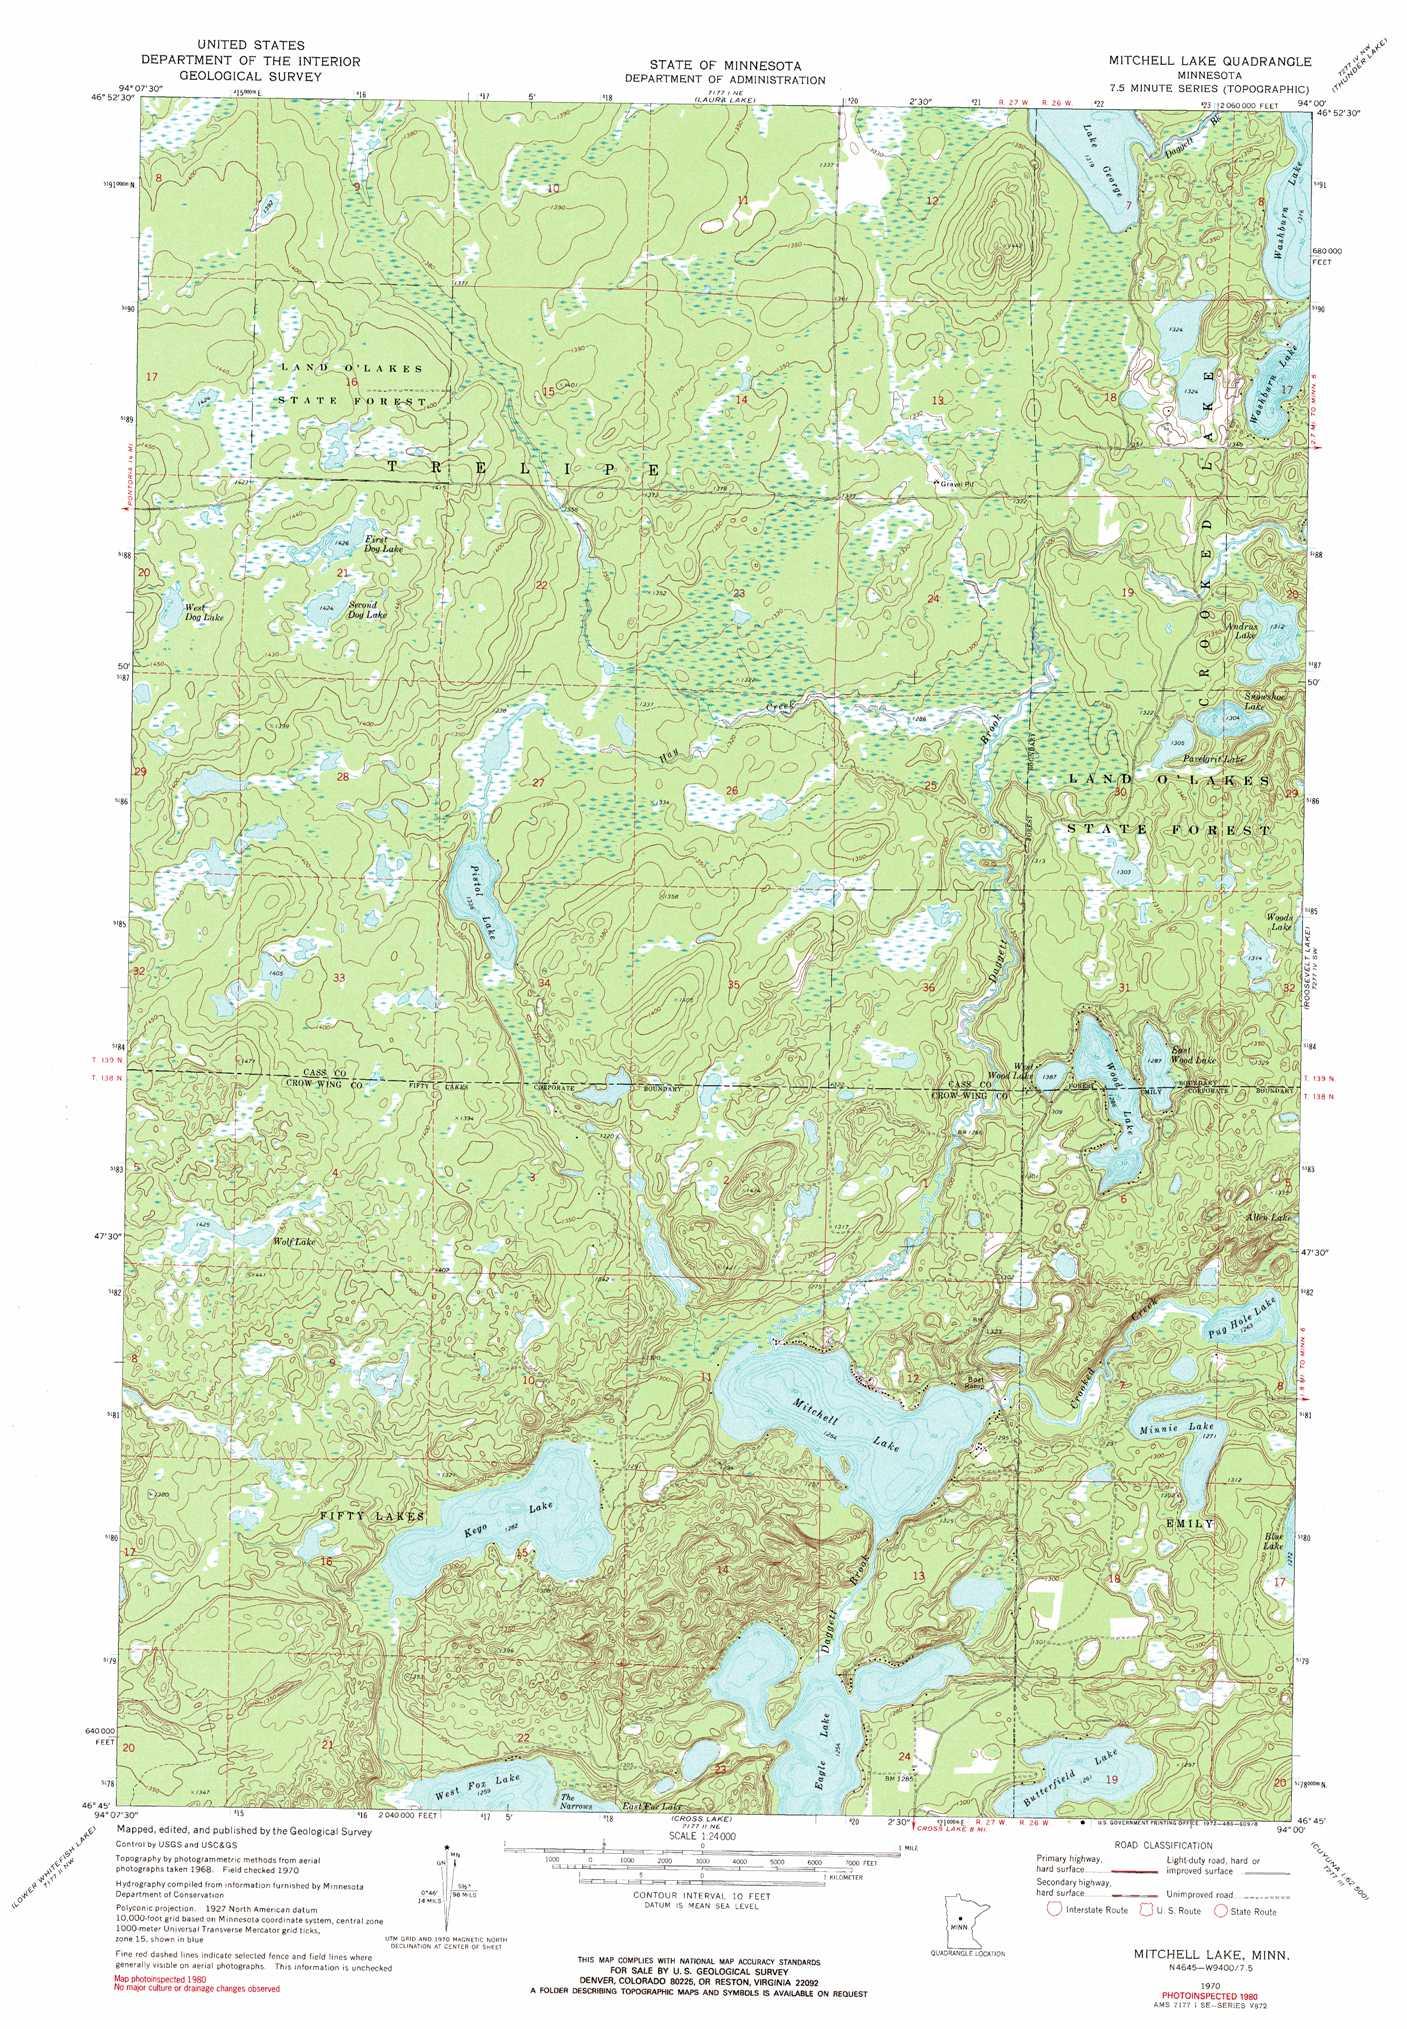 Mitchell Lake Topographic Map MN  USGS Topo Quad 46094g1